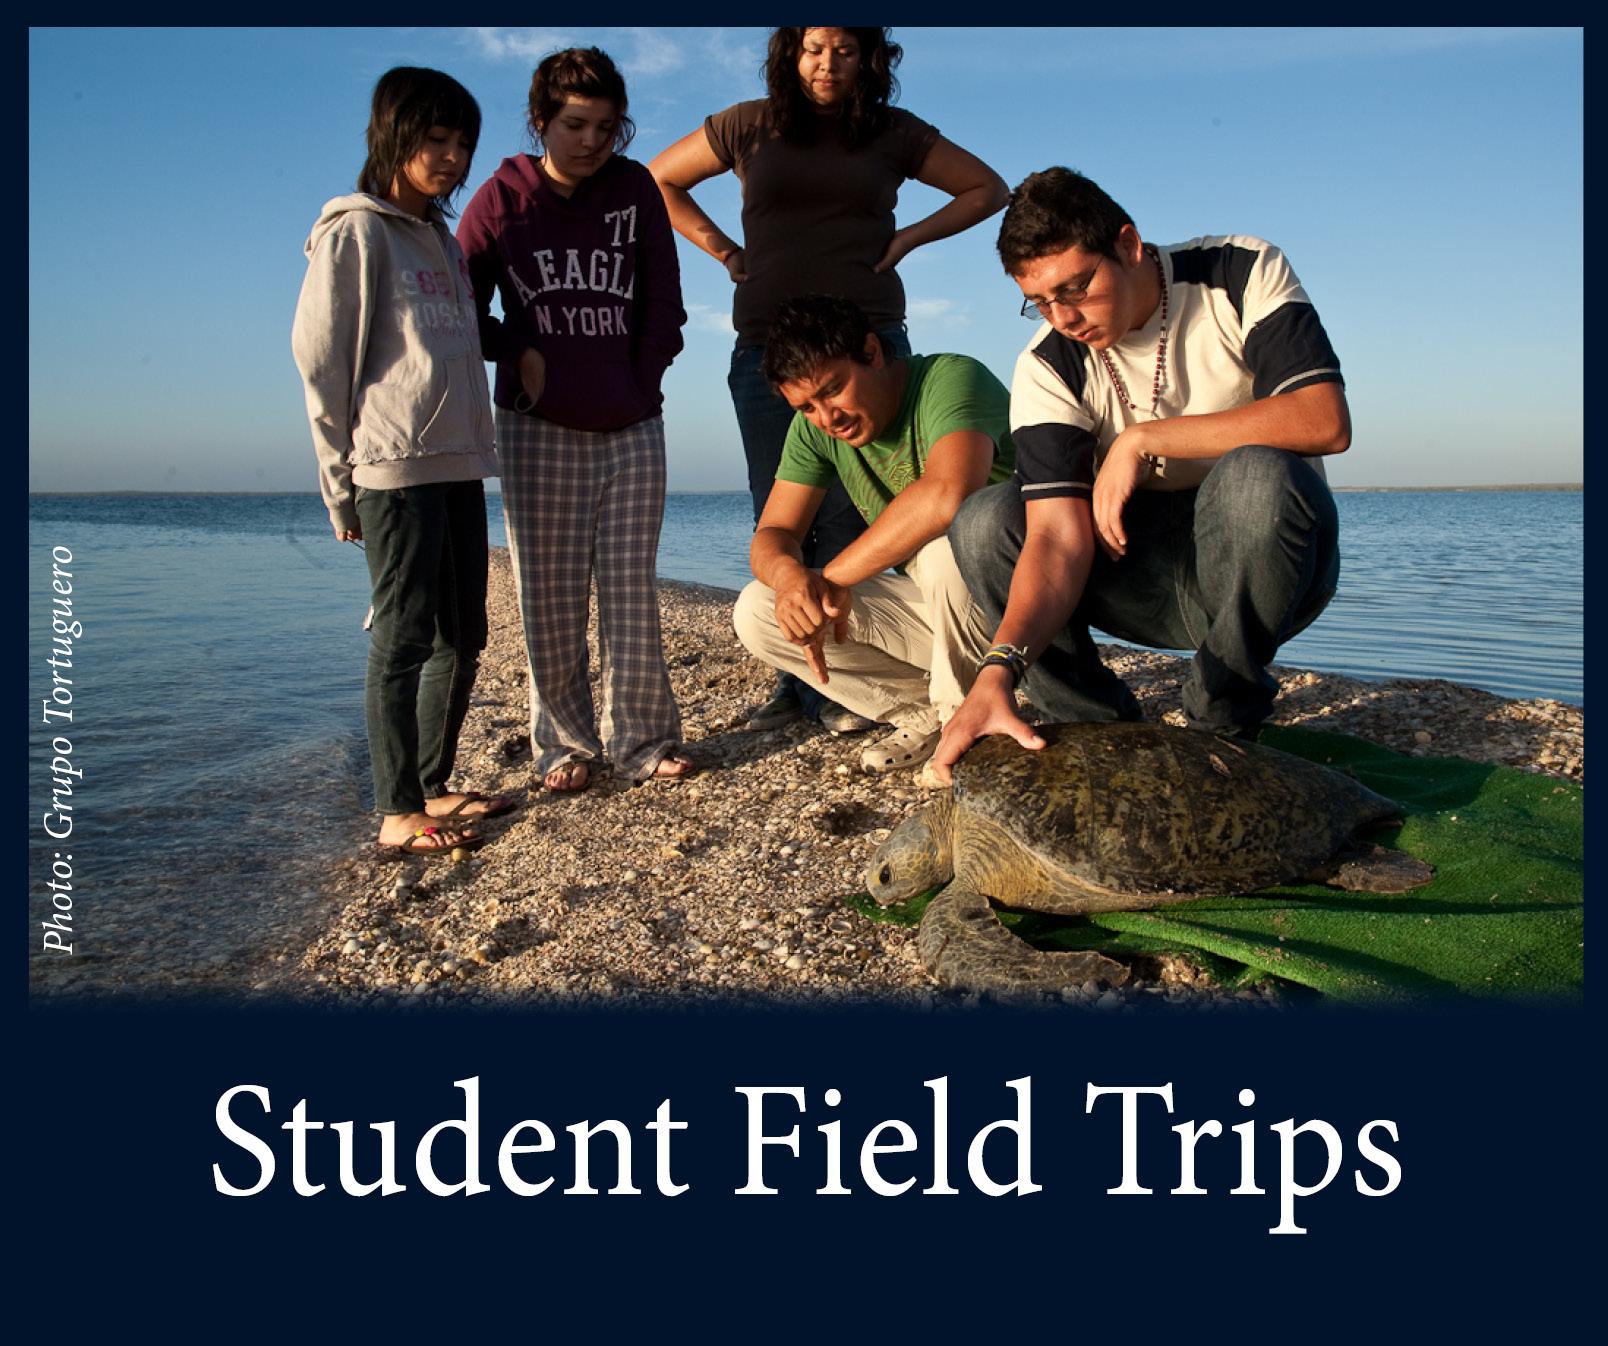 Student Field Trips Button.jpg